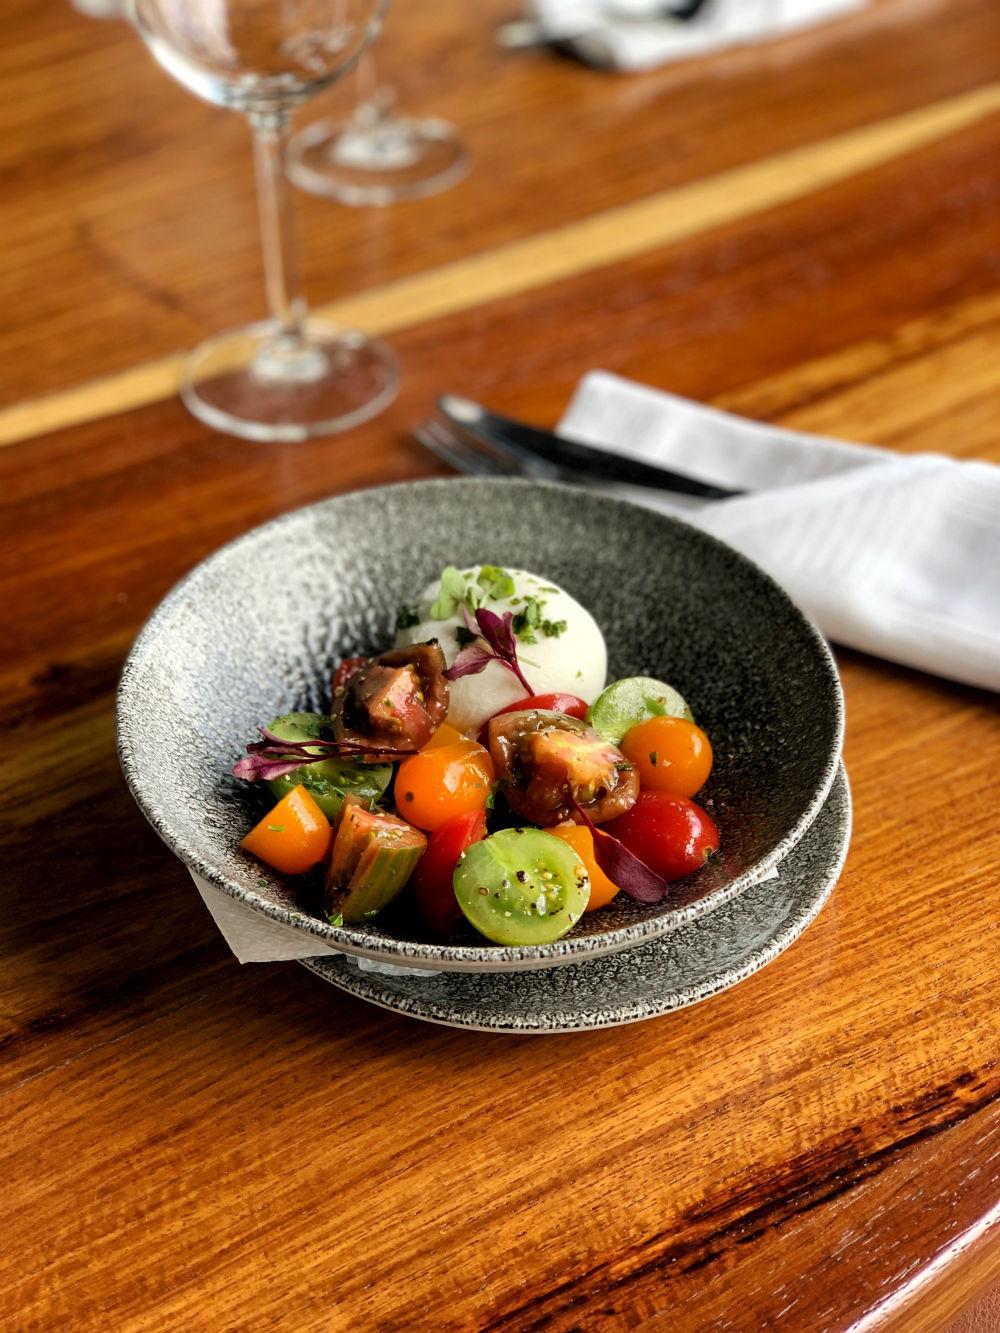 Burrata, exotic tomato salad & honey balsamic dressing.